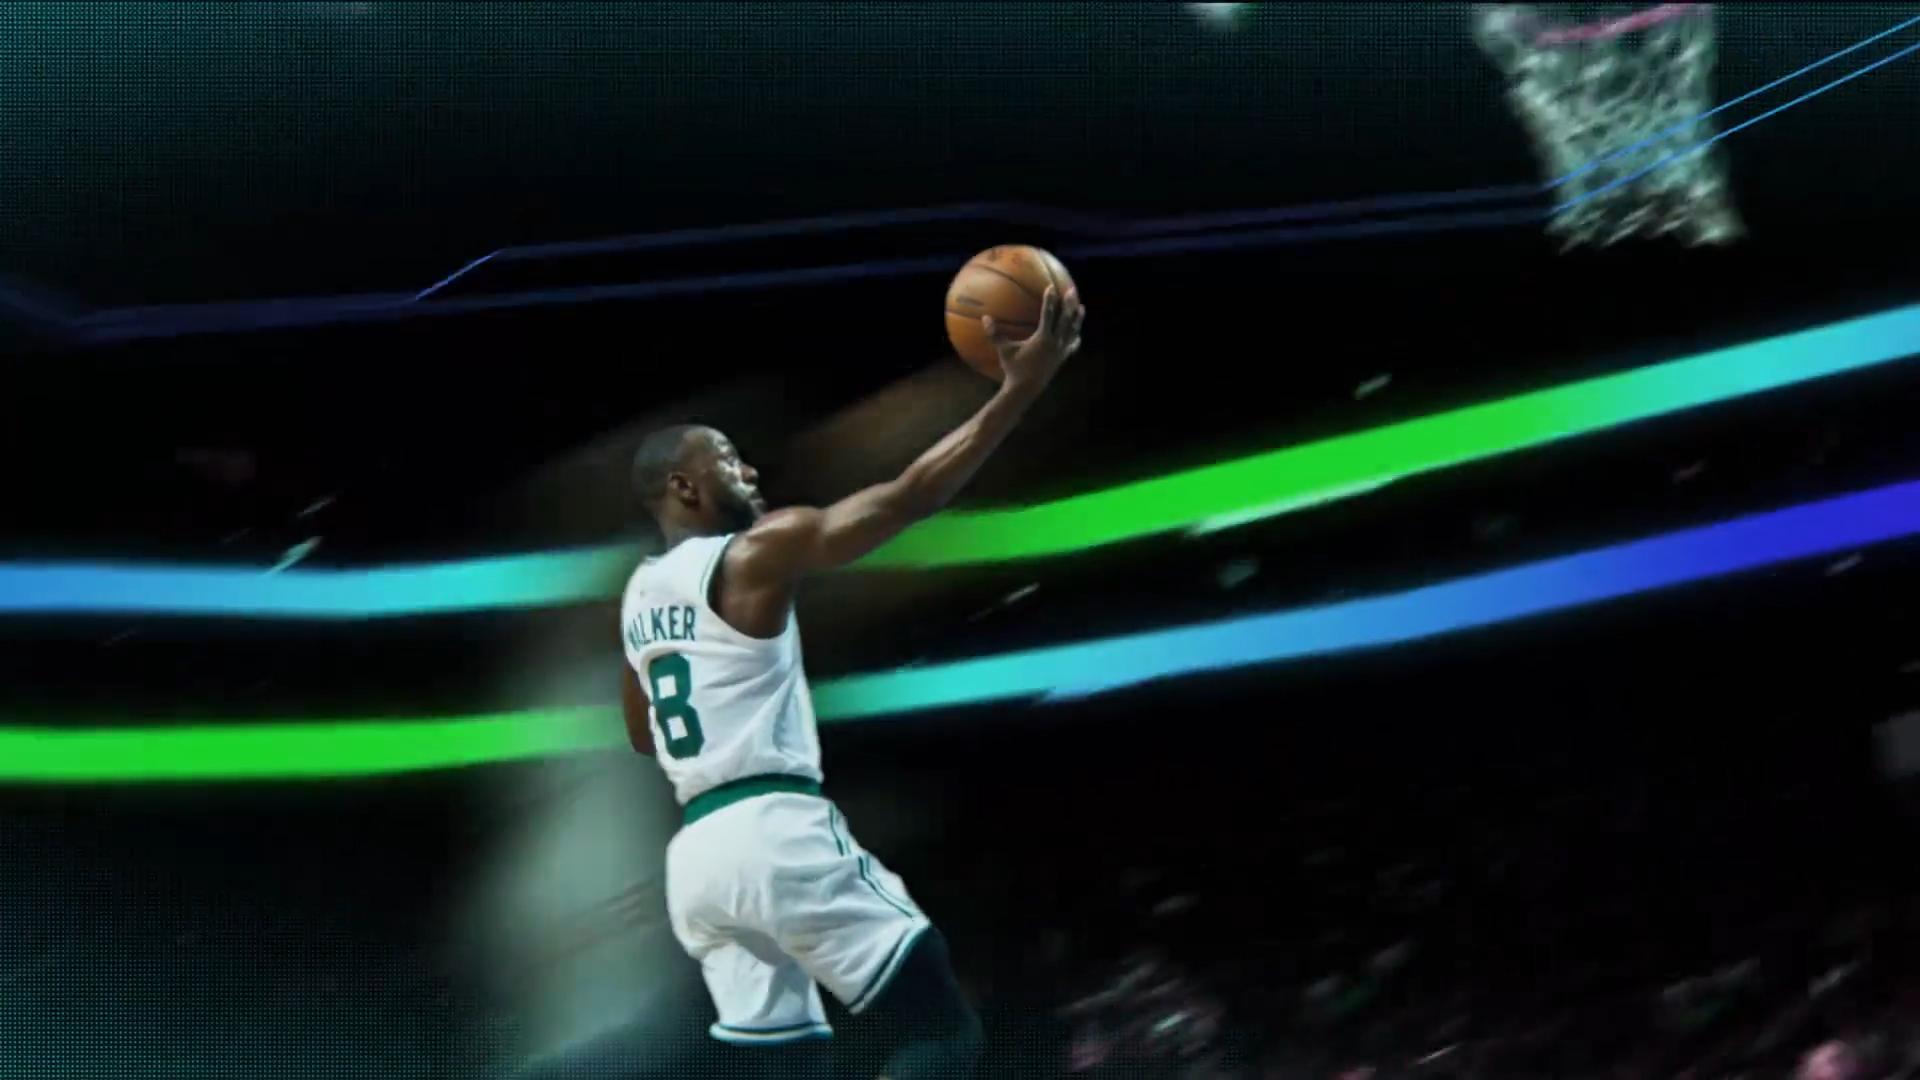 NBA DIMENSIONS COMPETITIVE EDGE